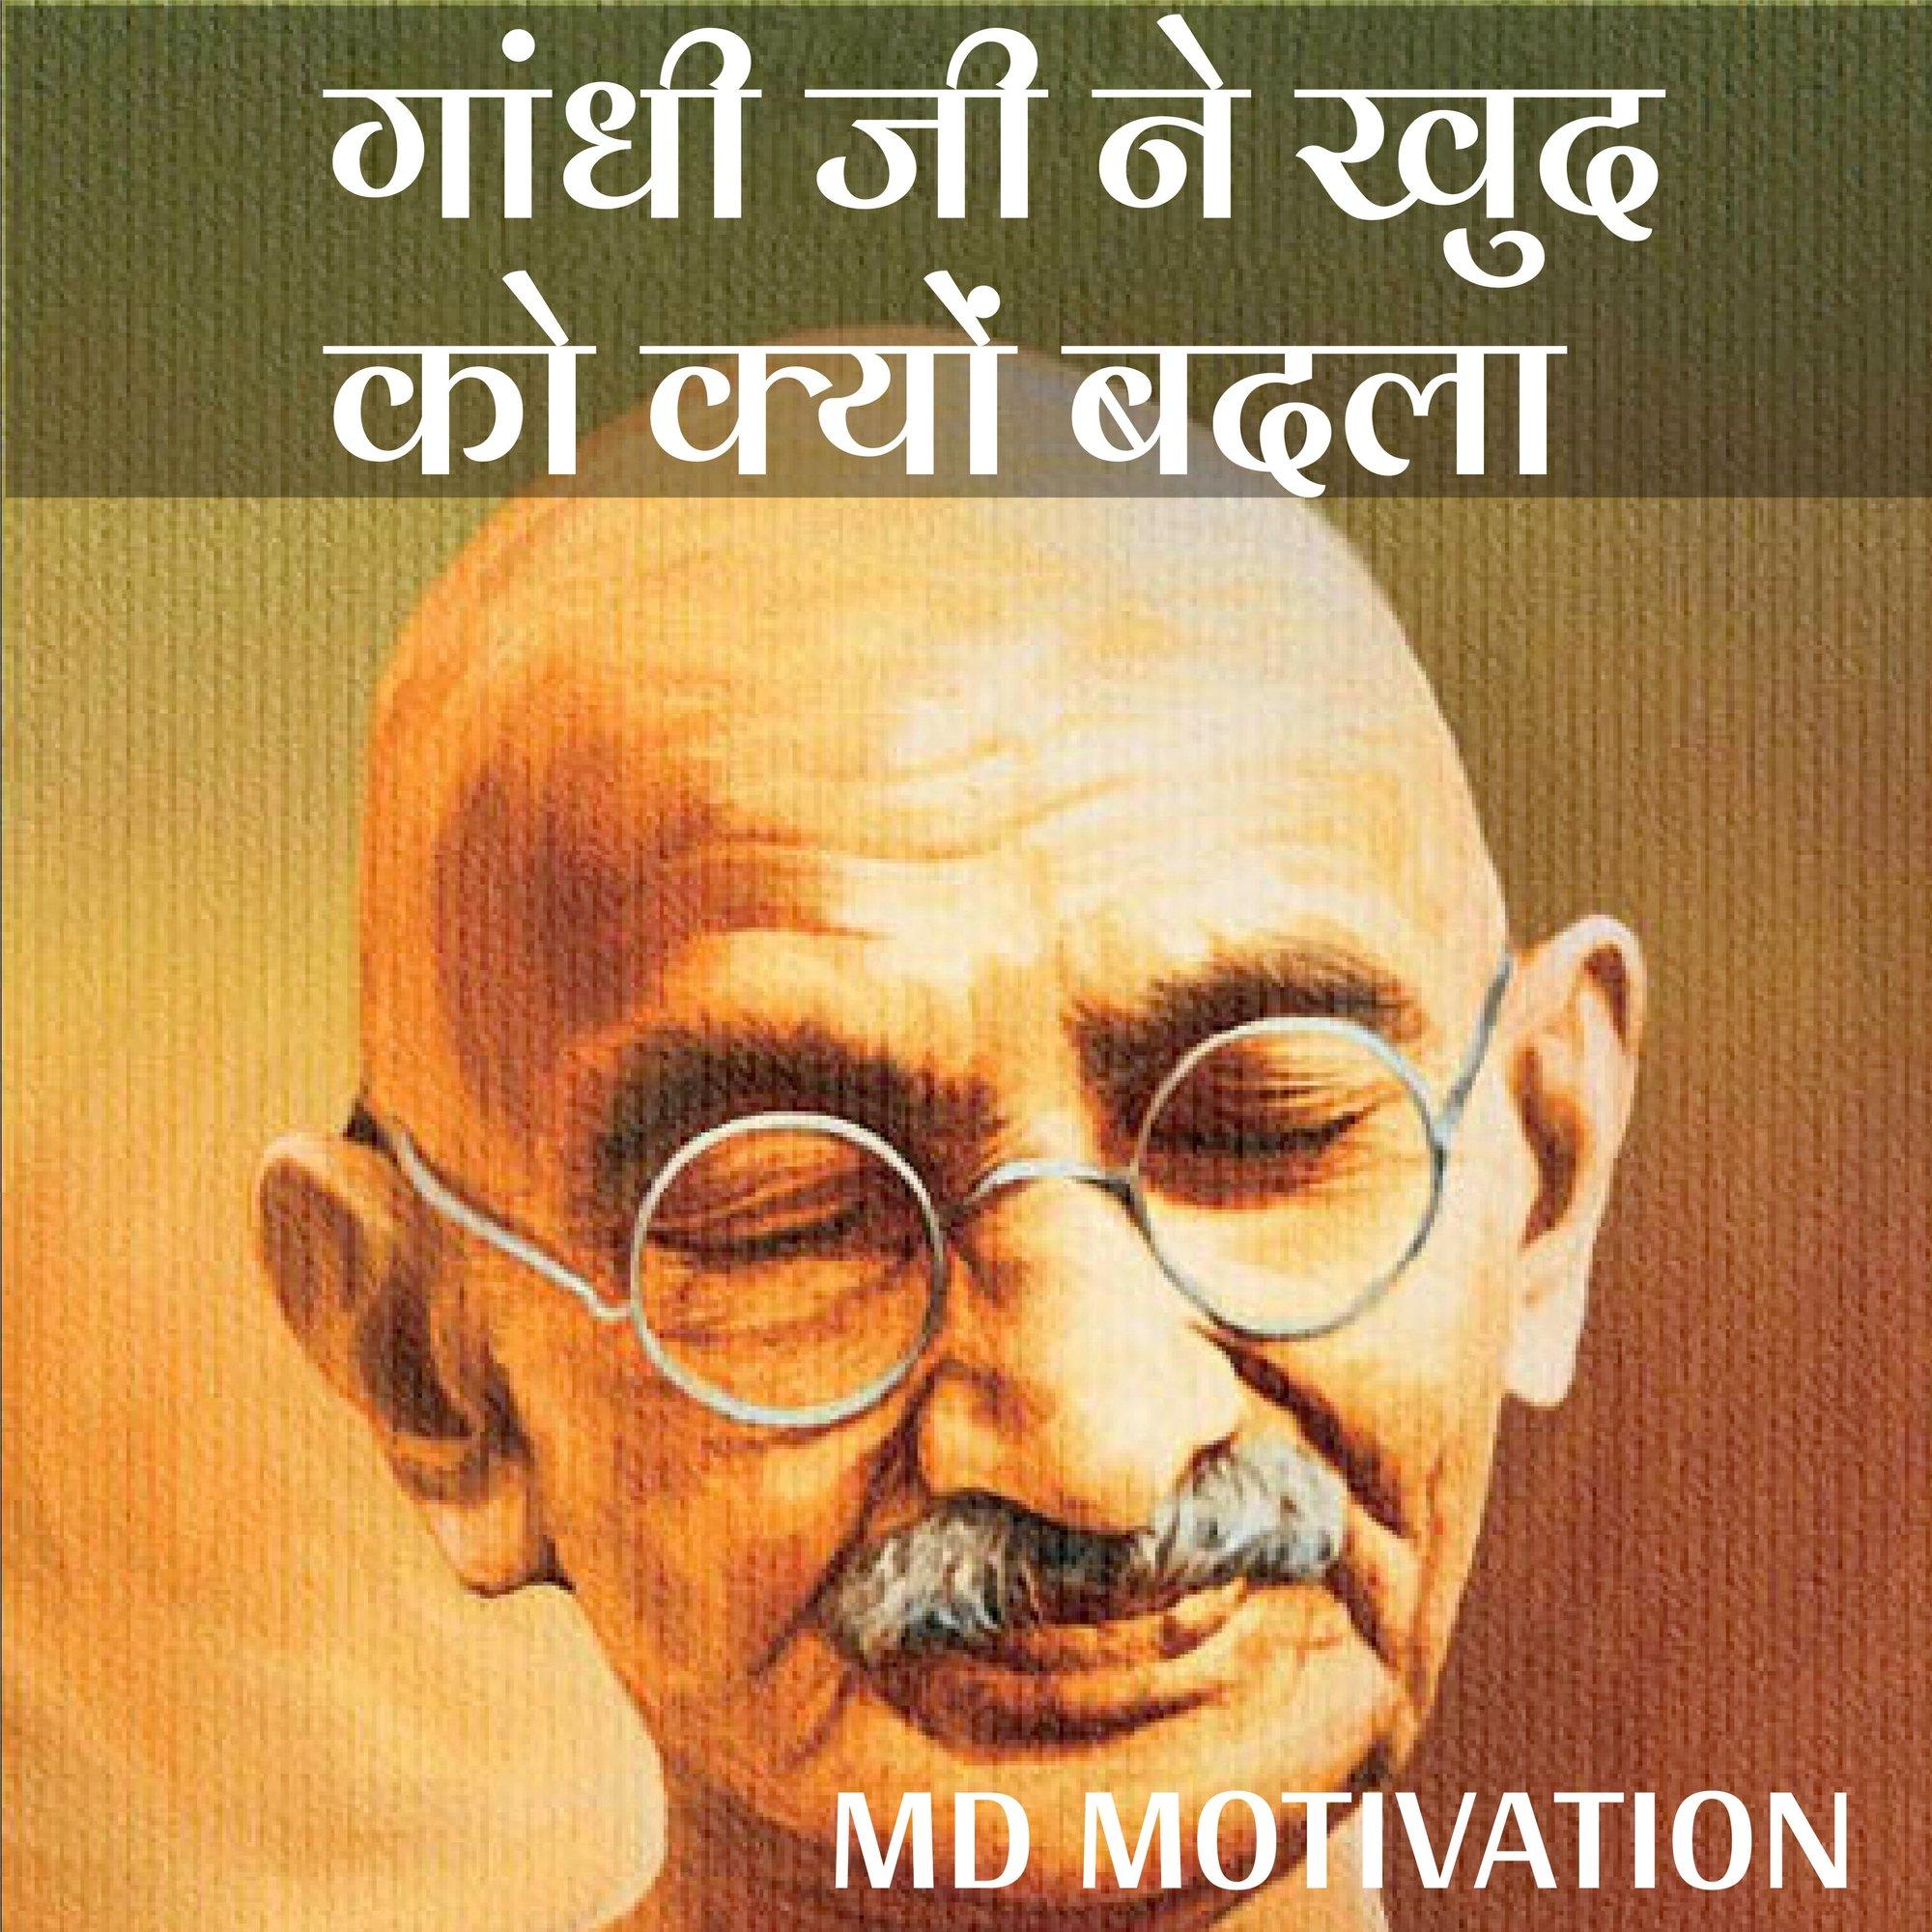 गाँधी जी ने खुद को क्यों बदला? MD Motivation |